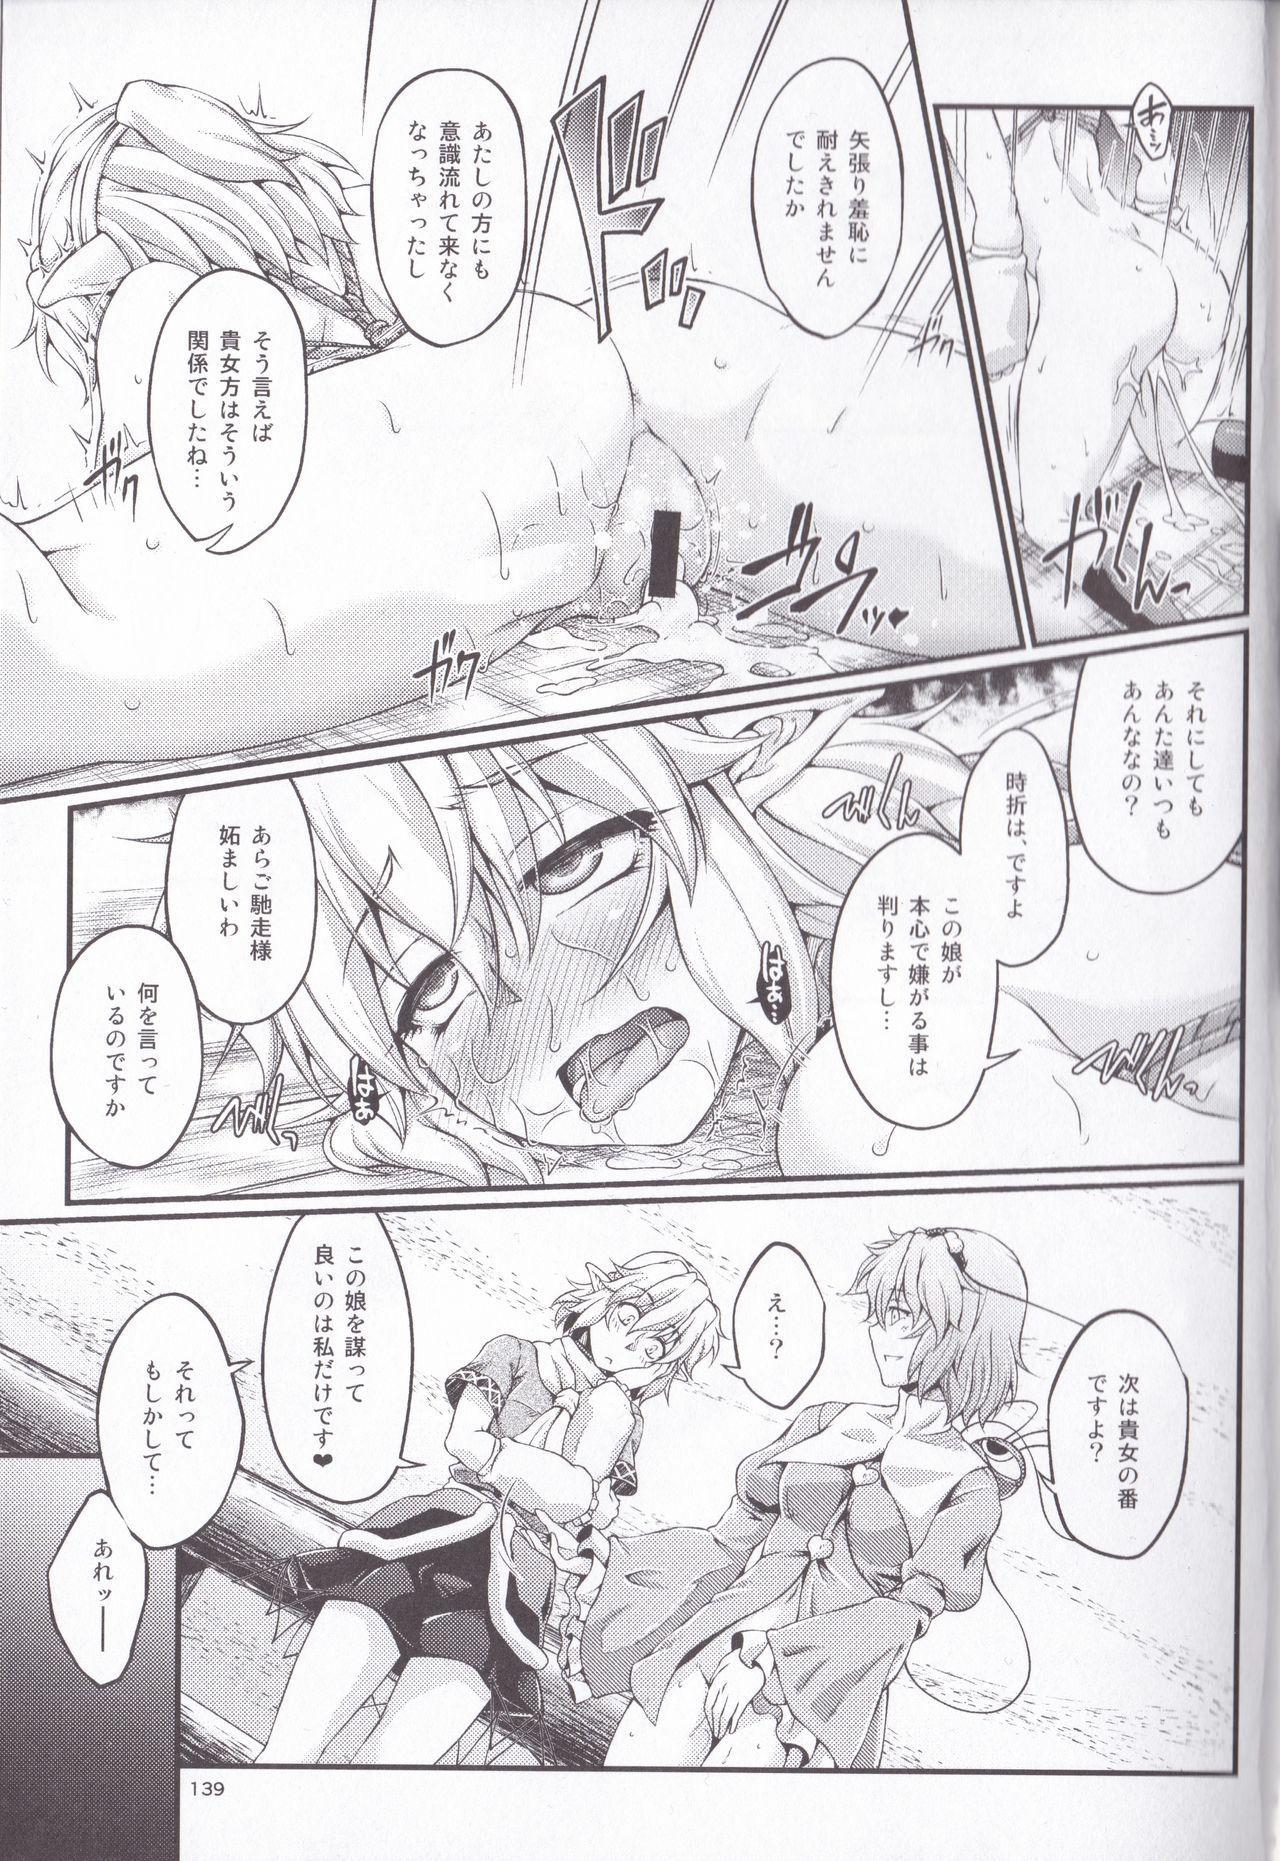 Hashihime Jougi 138